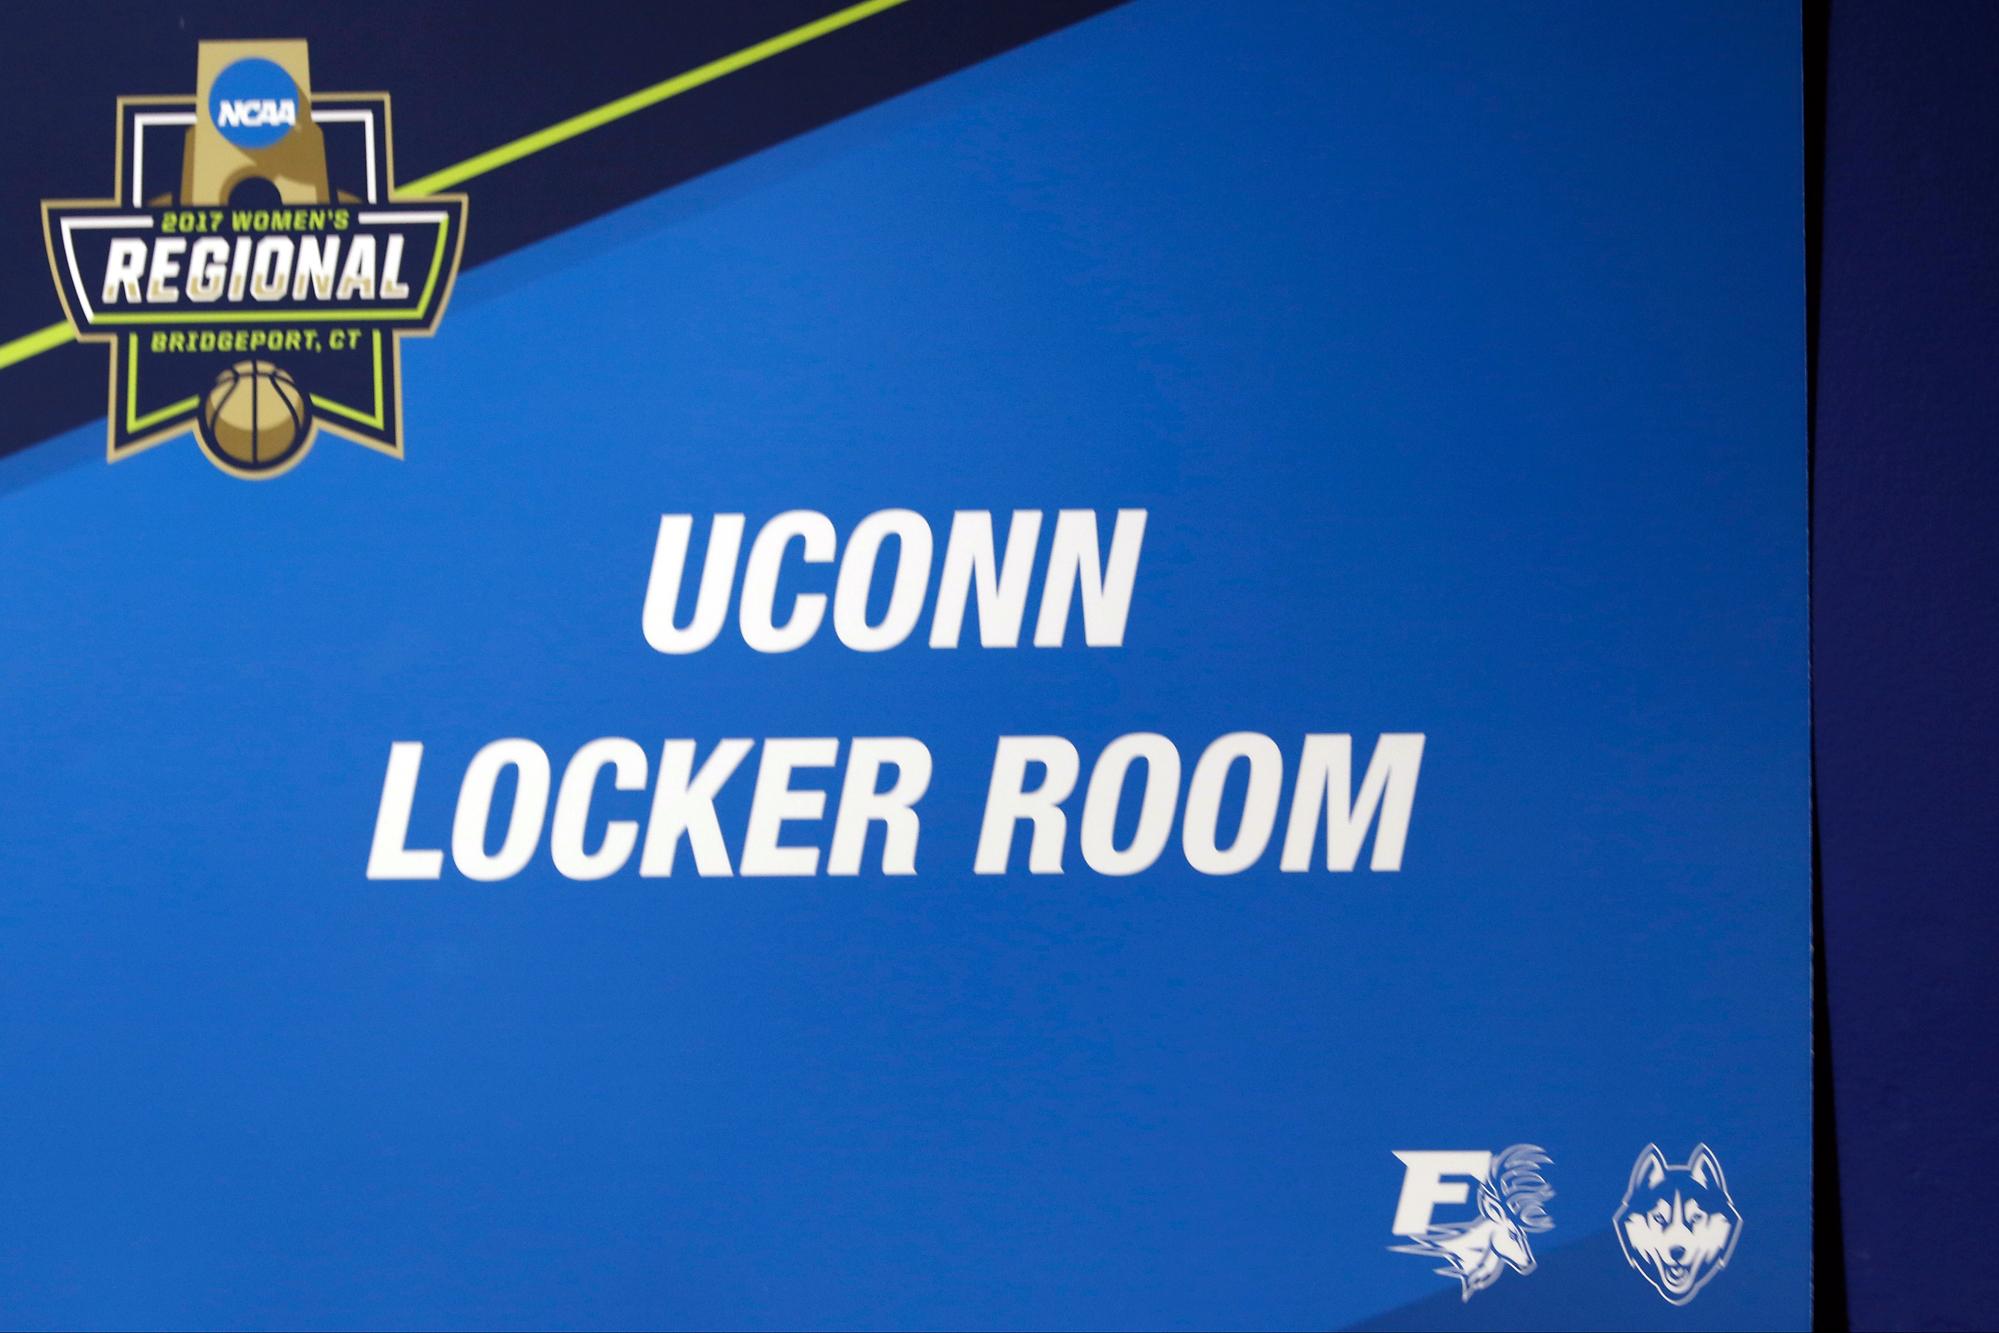 photos uconn women 39 s basketball ncaa tournament pregame sweet 16 the uconn blog. Black Bedroom Furniture Sets. Home Design Ideas